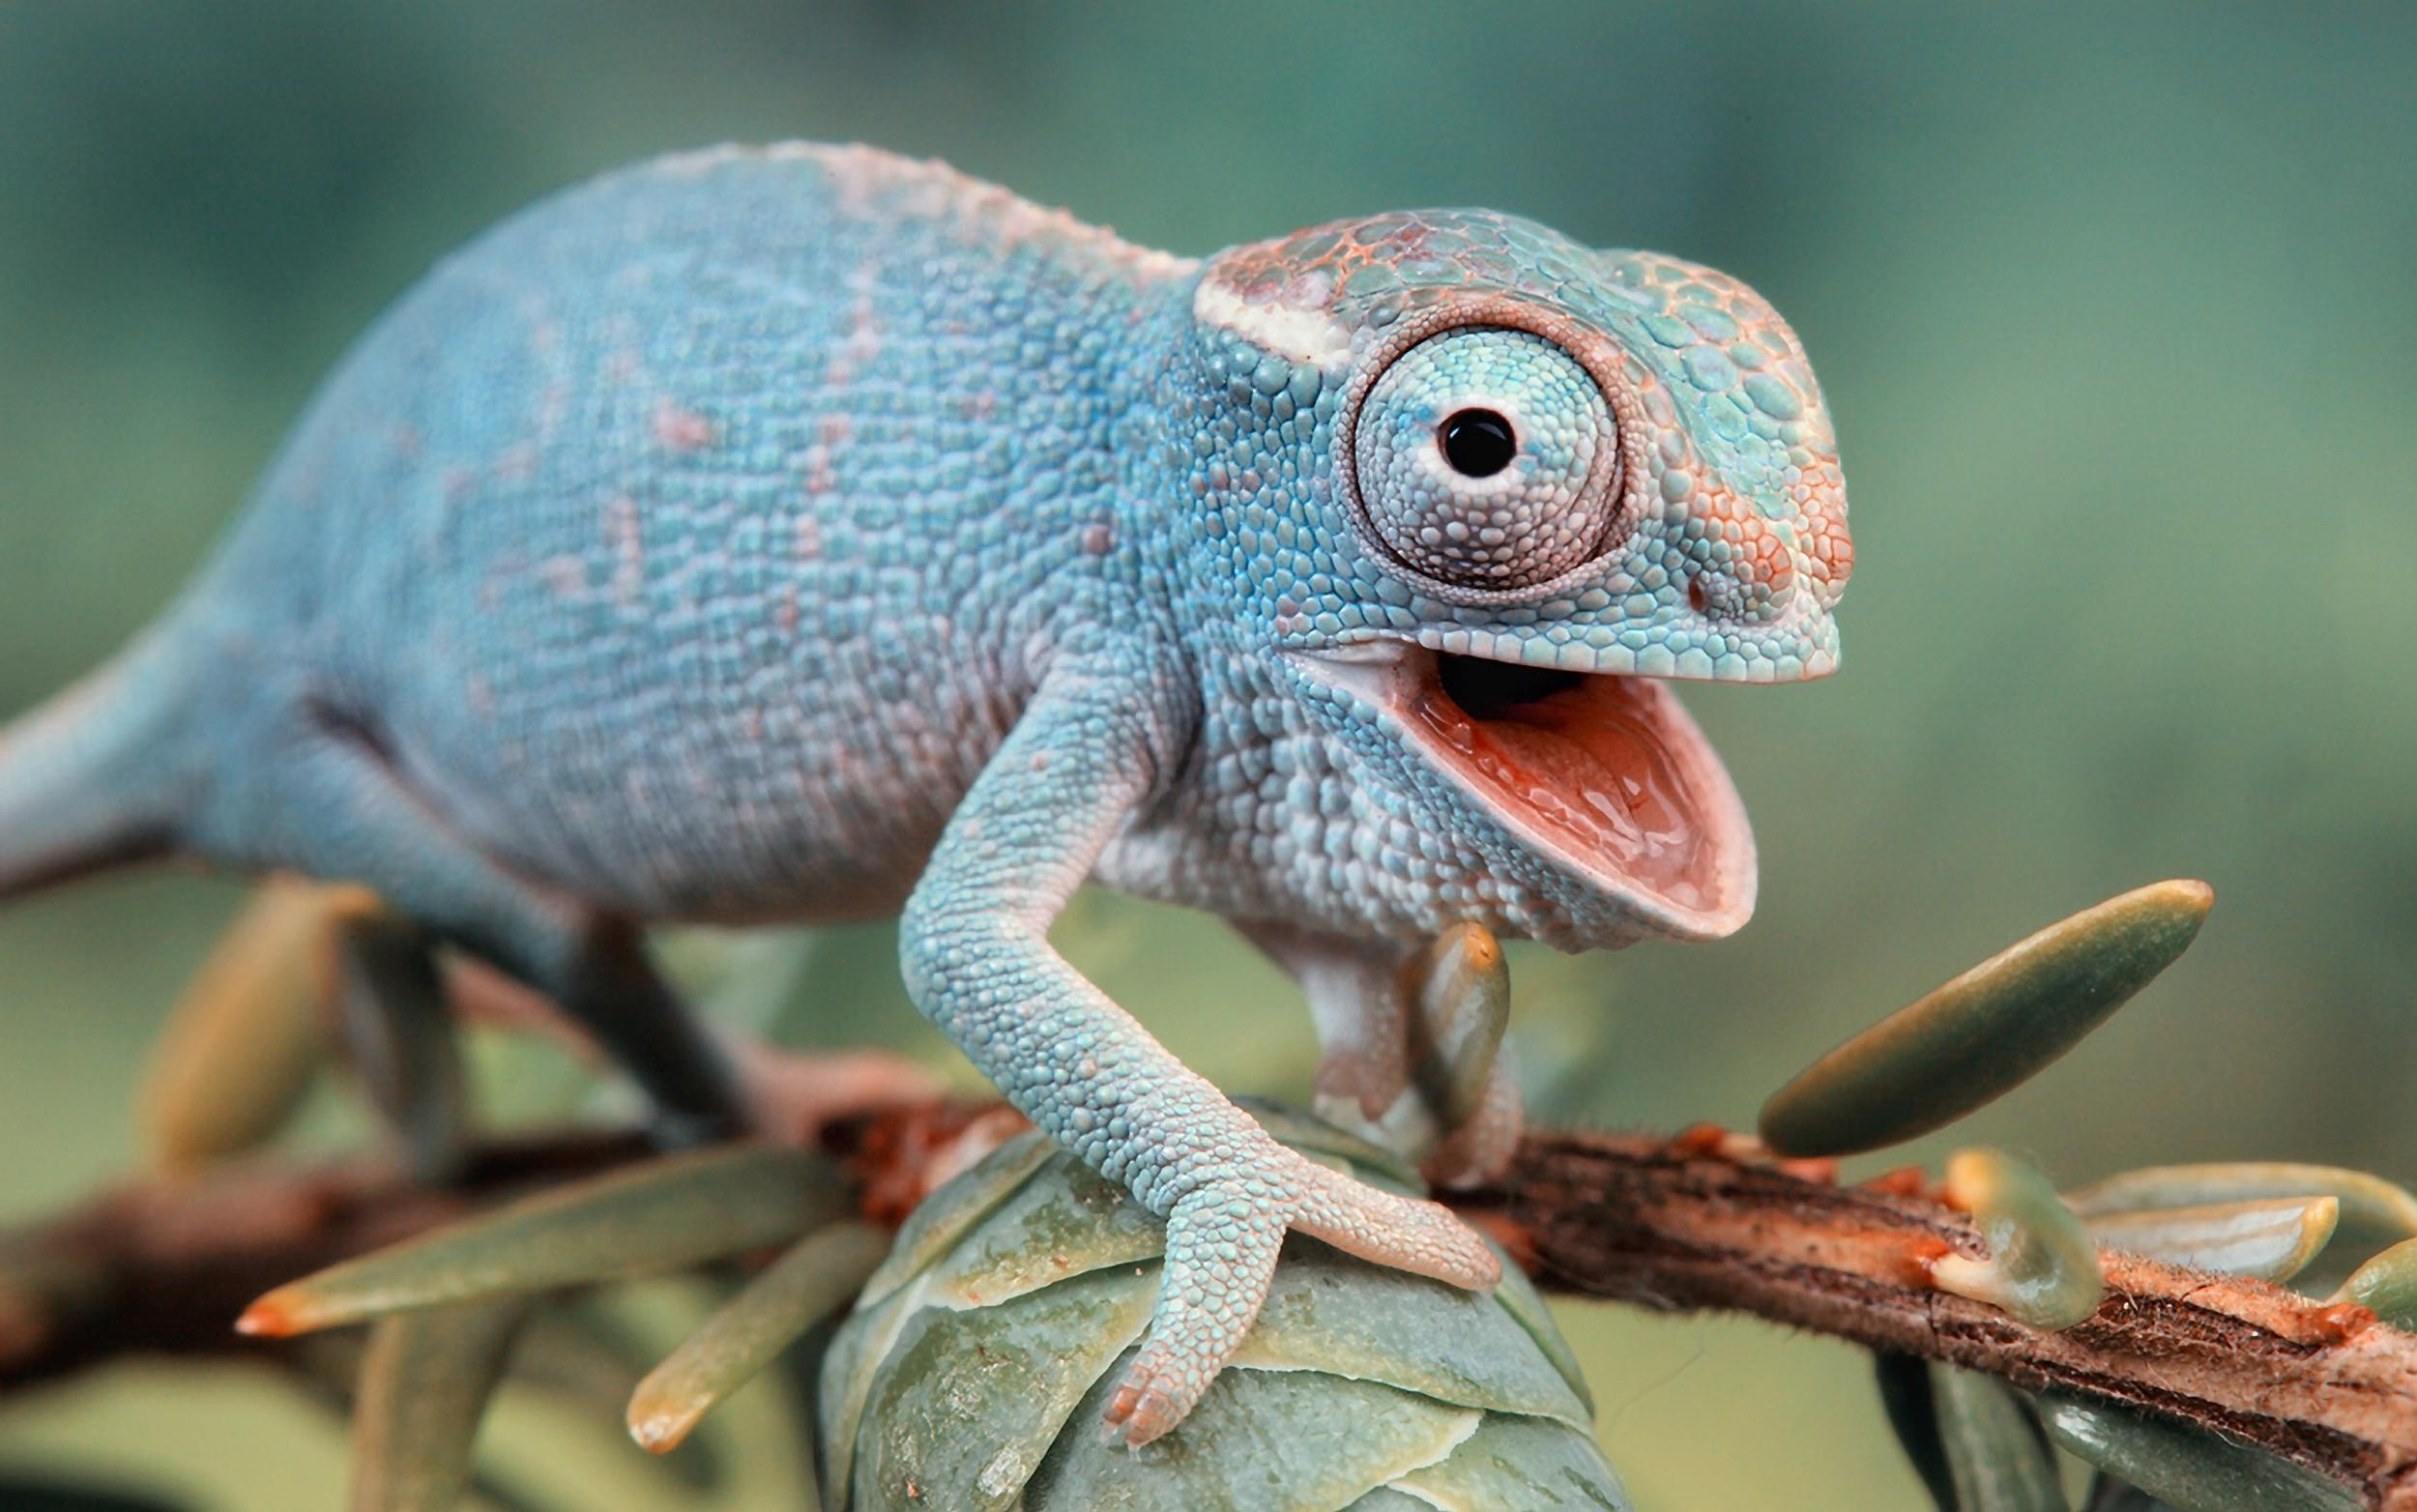 animals-chameleons-funny-lizards-reptiles-1554615-2558x1600.jpg